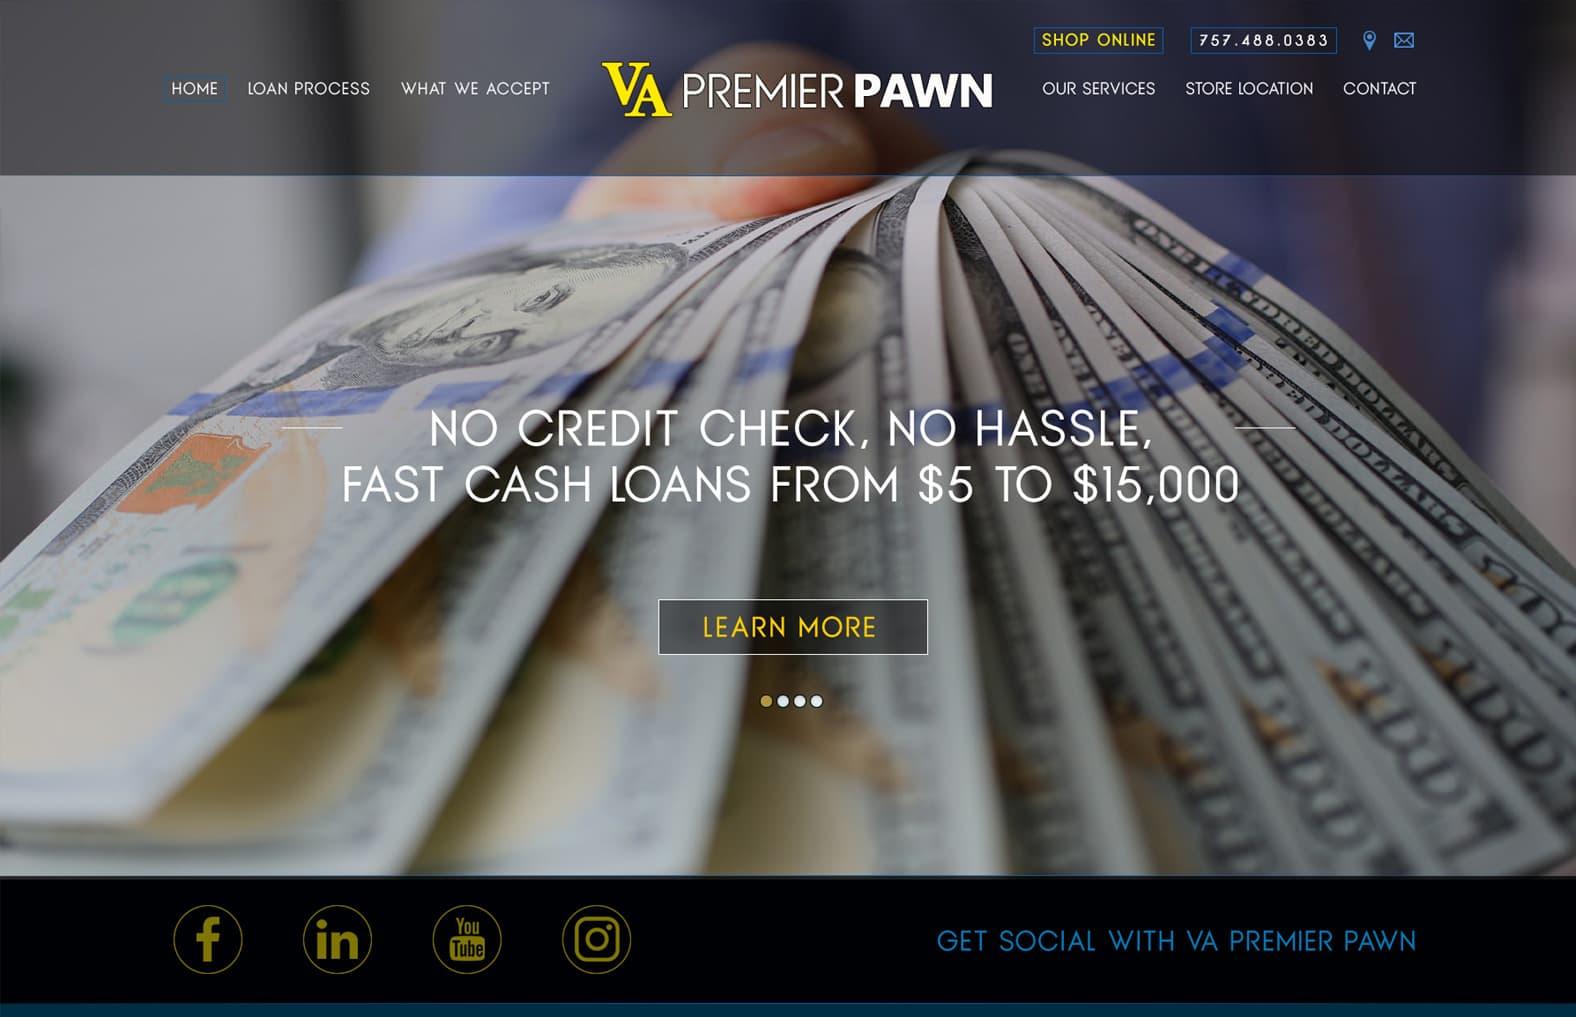 Web design for Loan Business